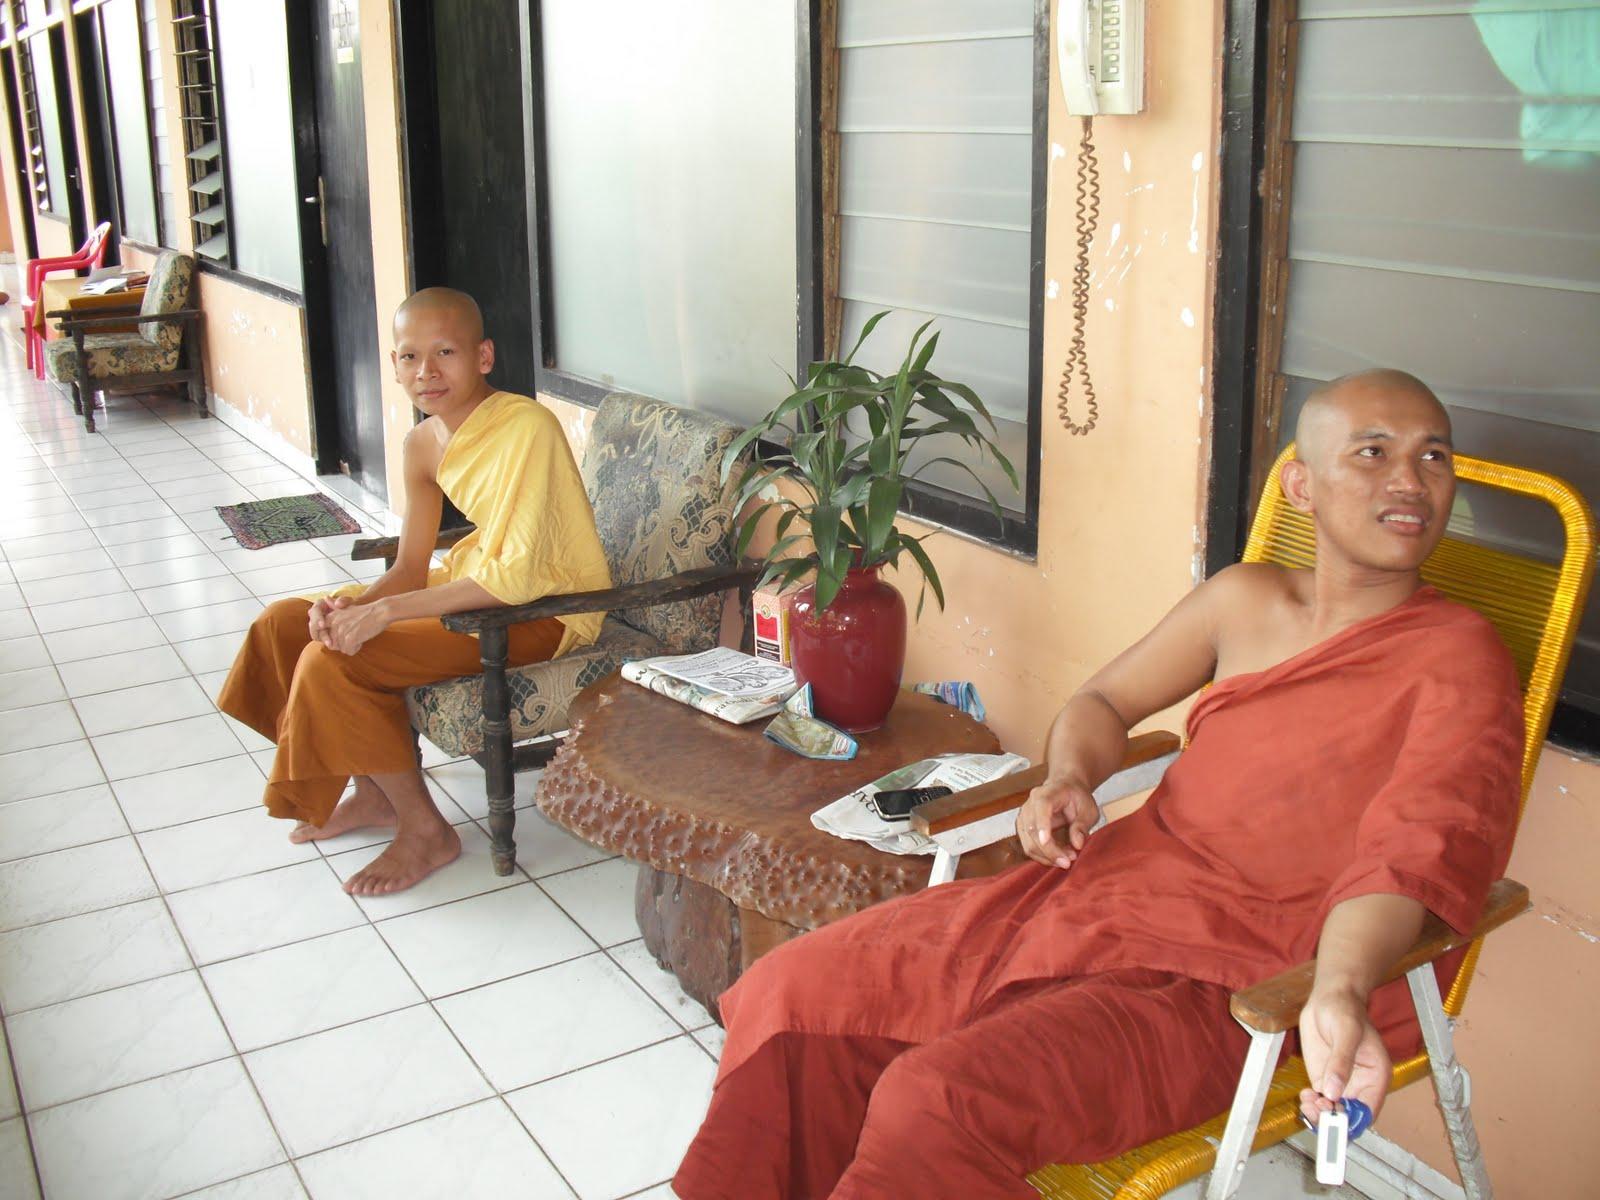 Blog Hurek Mahavihara Majapahit Buddha Tidur Bangunan Awalnya Sederhana Direnovasi